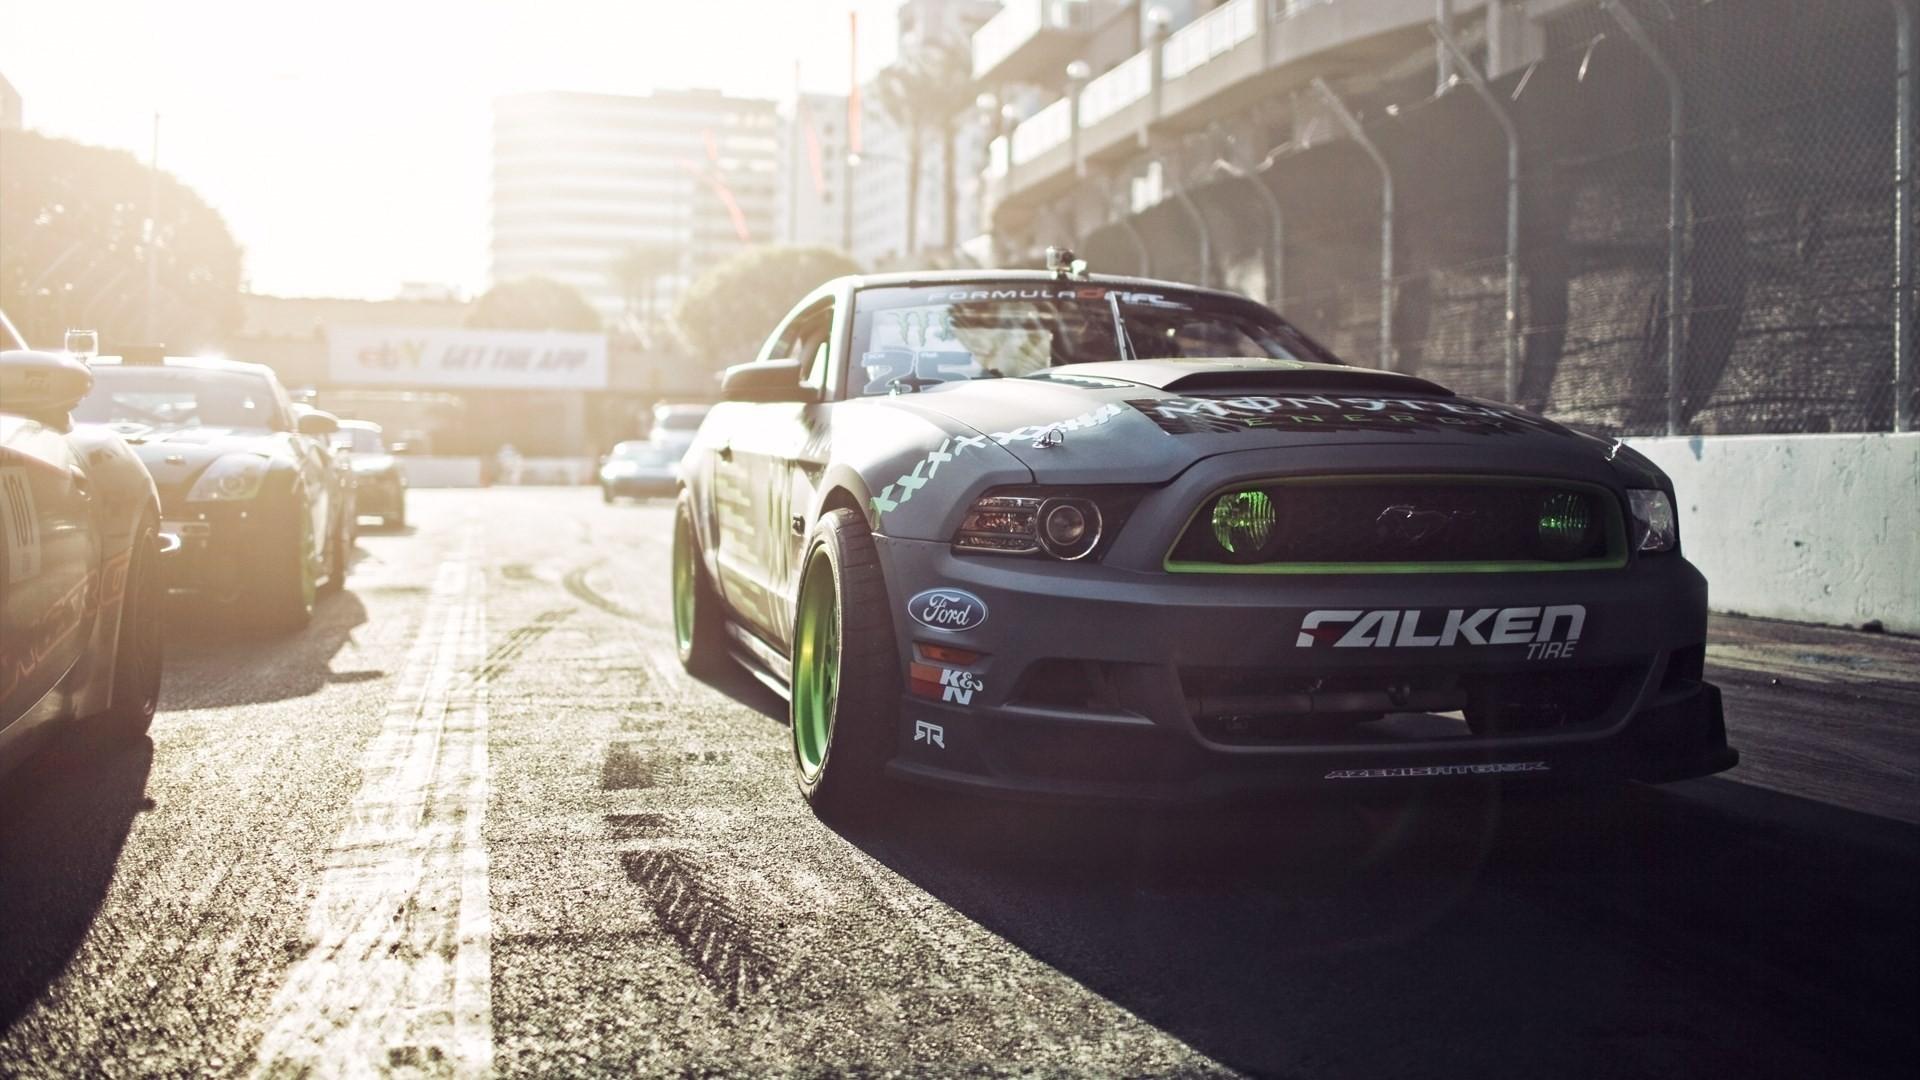 Car Wallpapers Backgrounds Hd: Drift Car Wallpaper (74+ Images